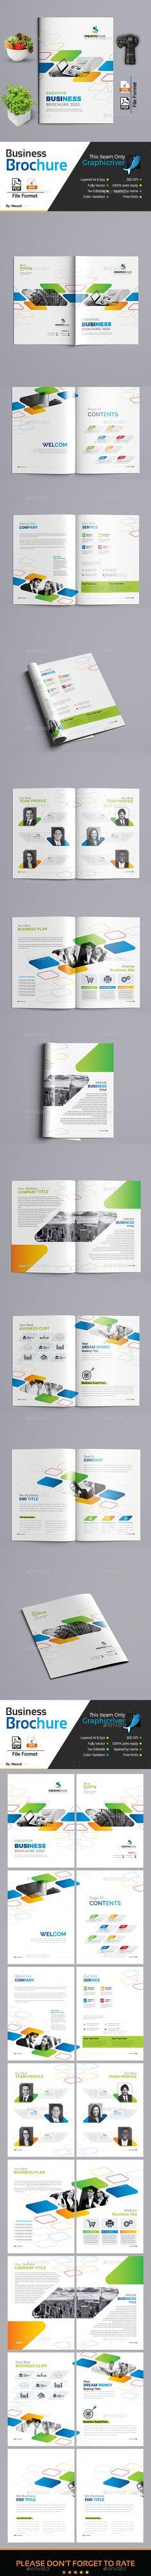 Yachting Brochure Bundle 2 | Pinterest | Brochures, Brochure ...